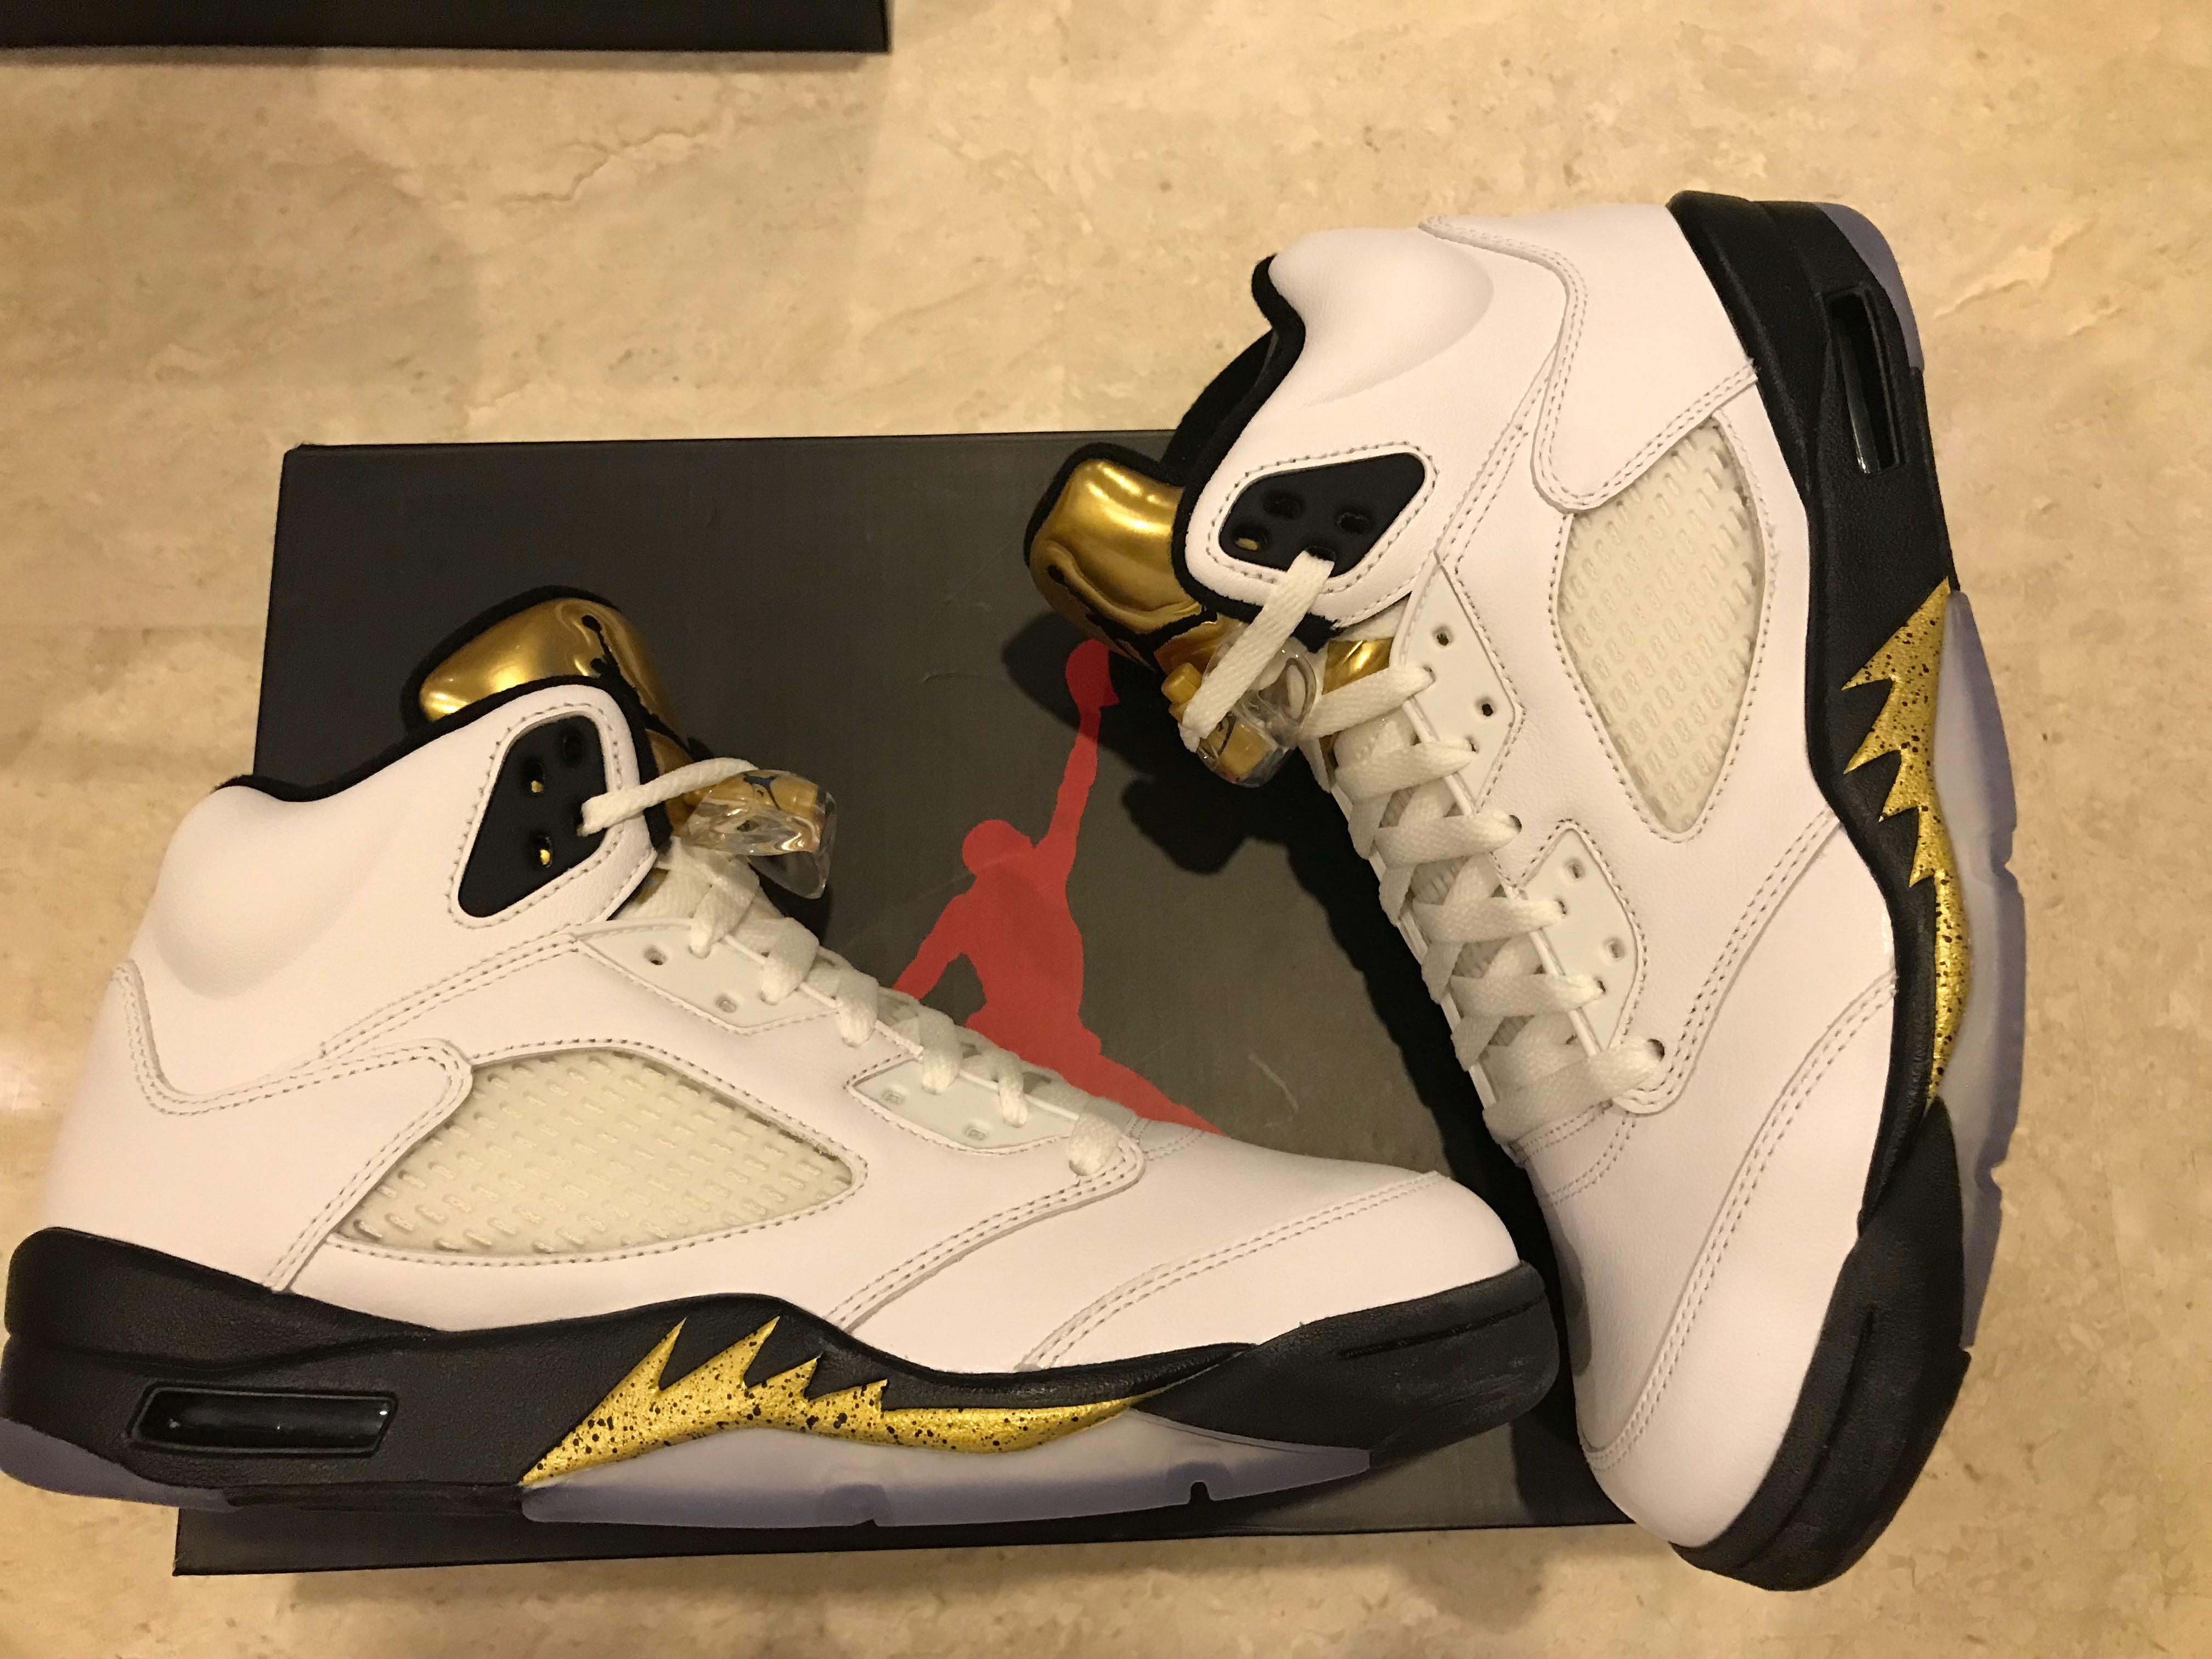 26346733da498 Nike Air Jordan Retro 5 Olympic Gold $300 BNIB, Men's Fashion ...